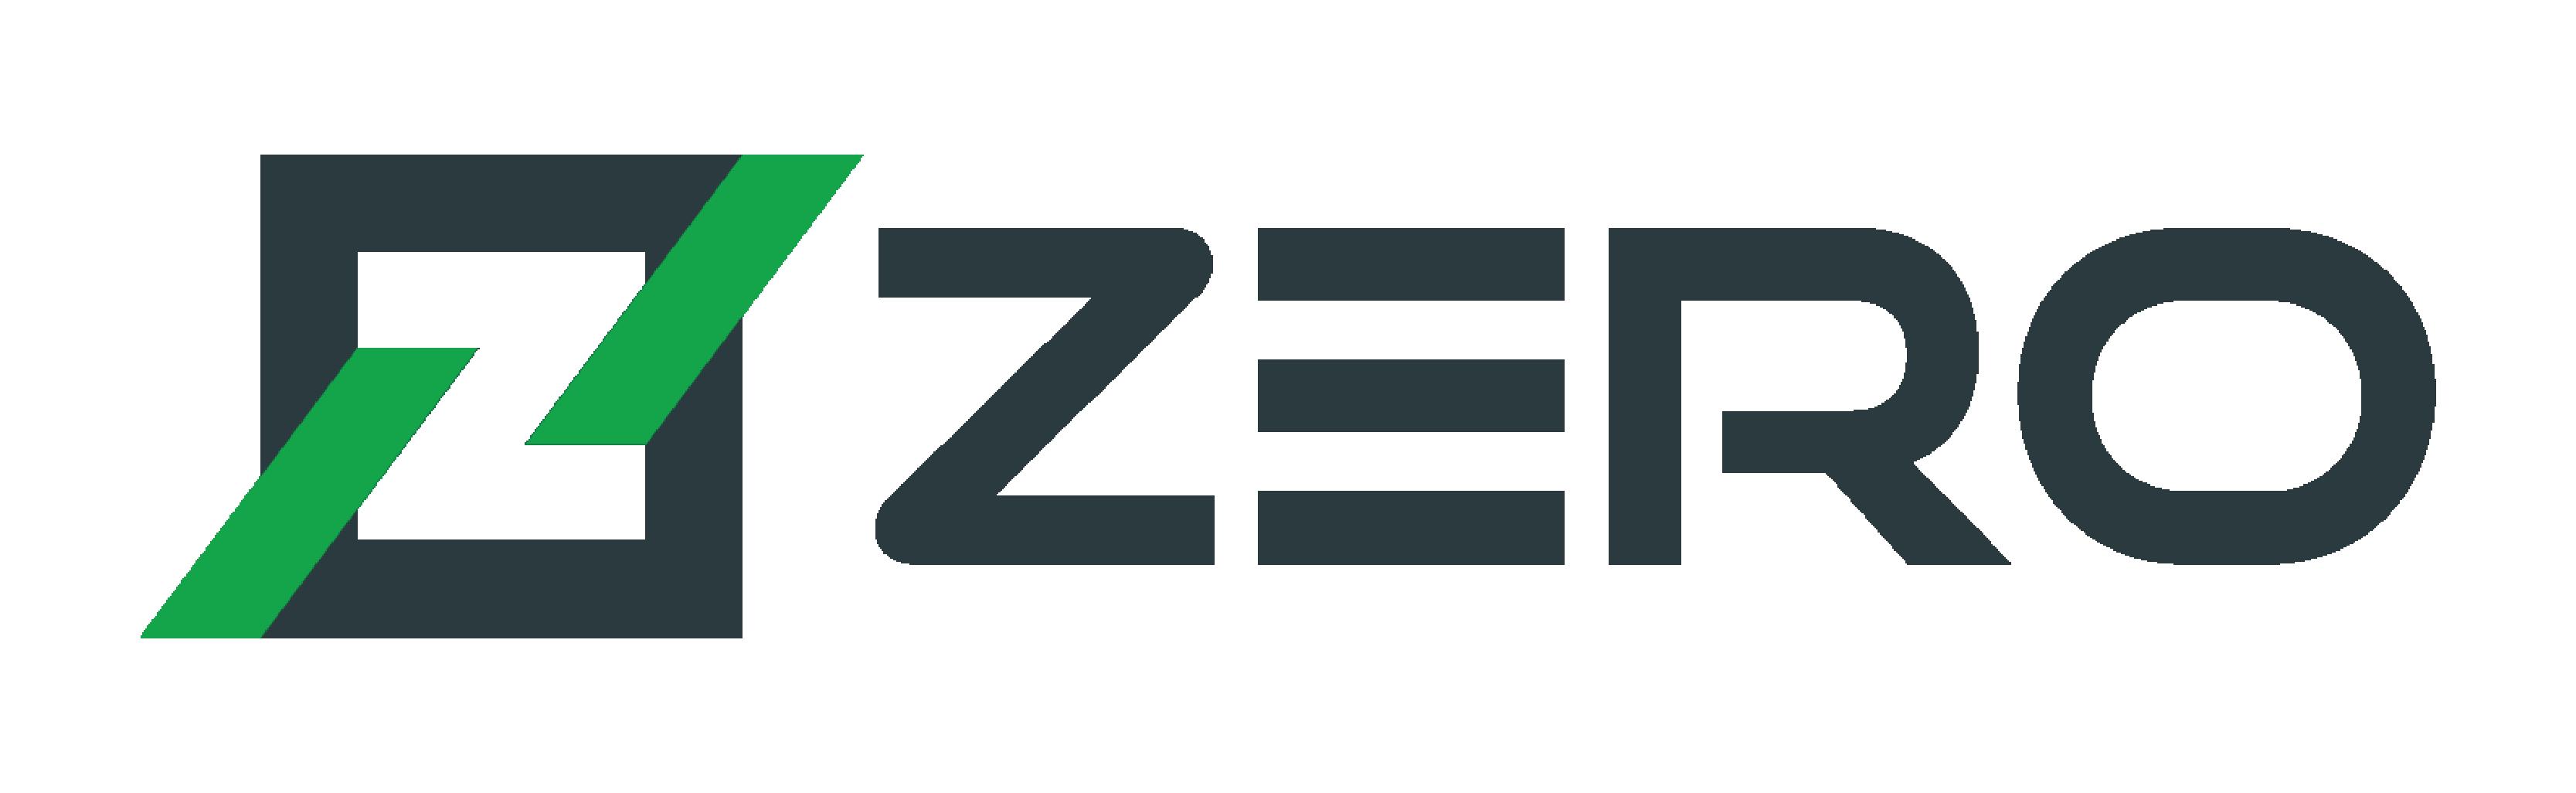 Zero Markets